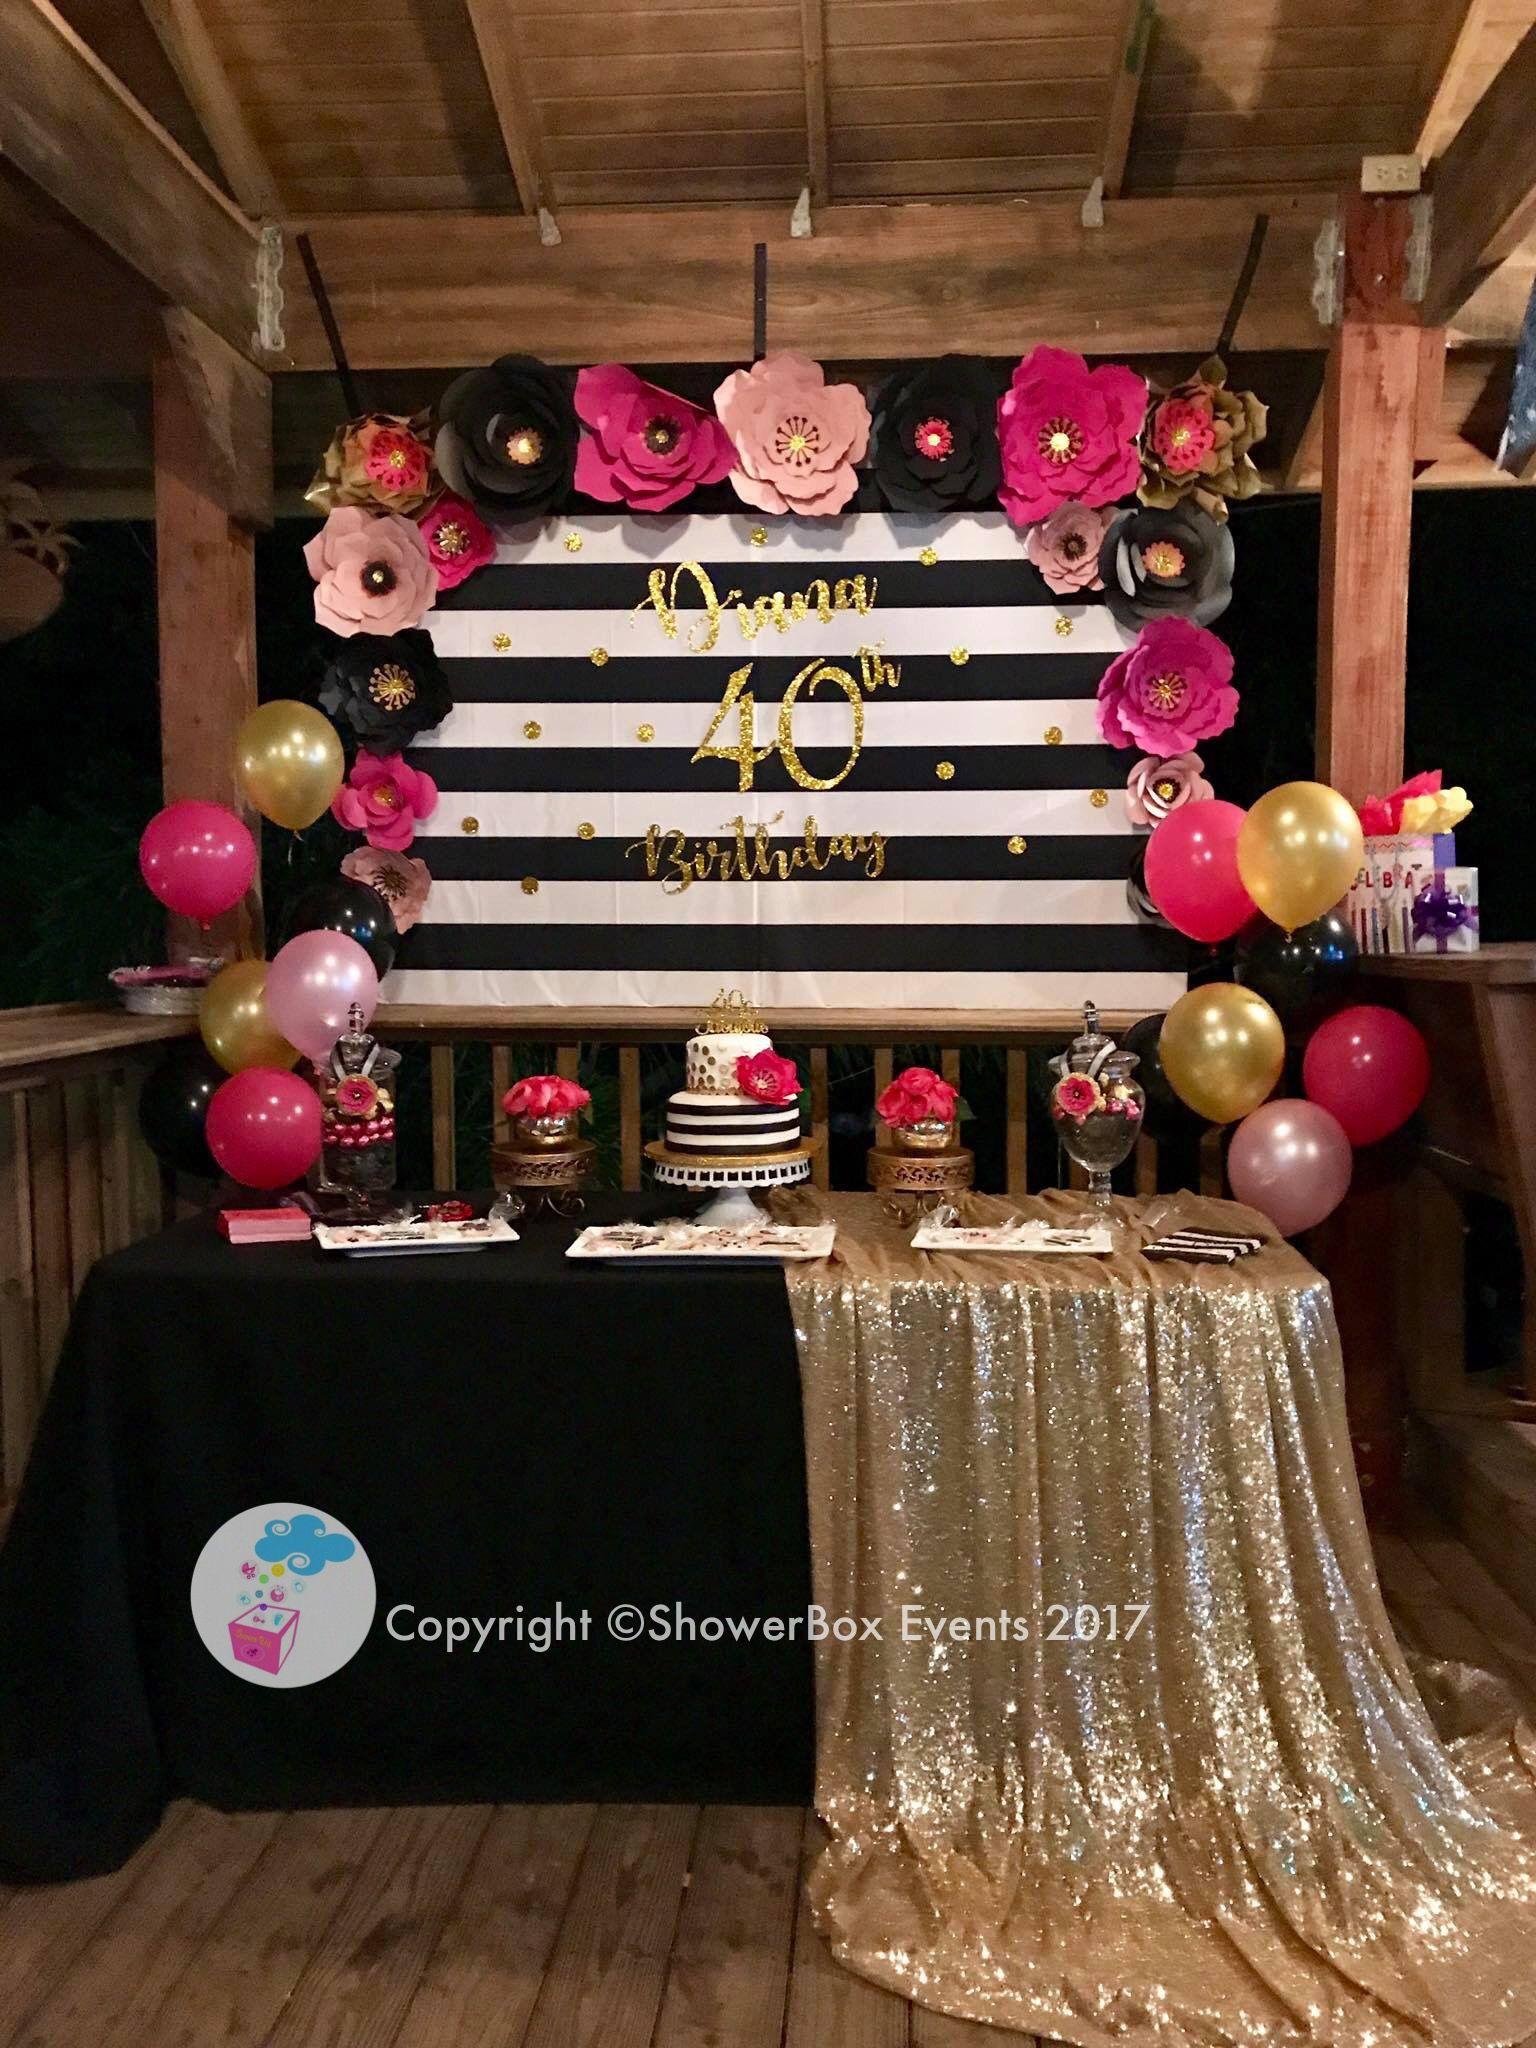 40th Birthday Showerbox Events 2017 Like Us On Fb Myshowe 40th